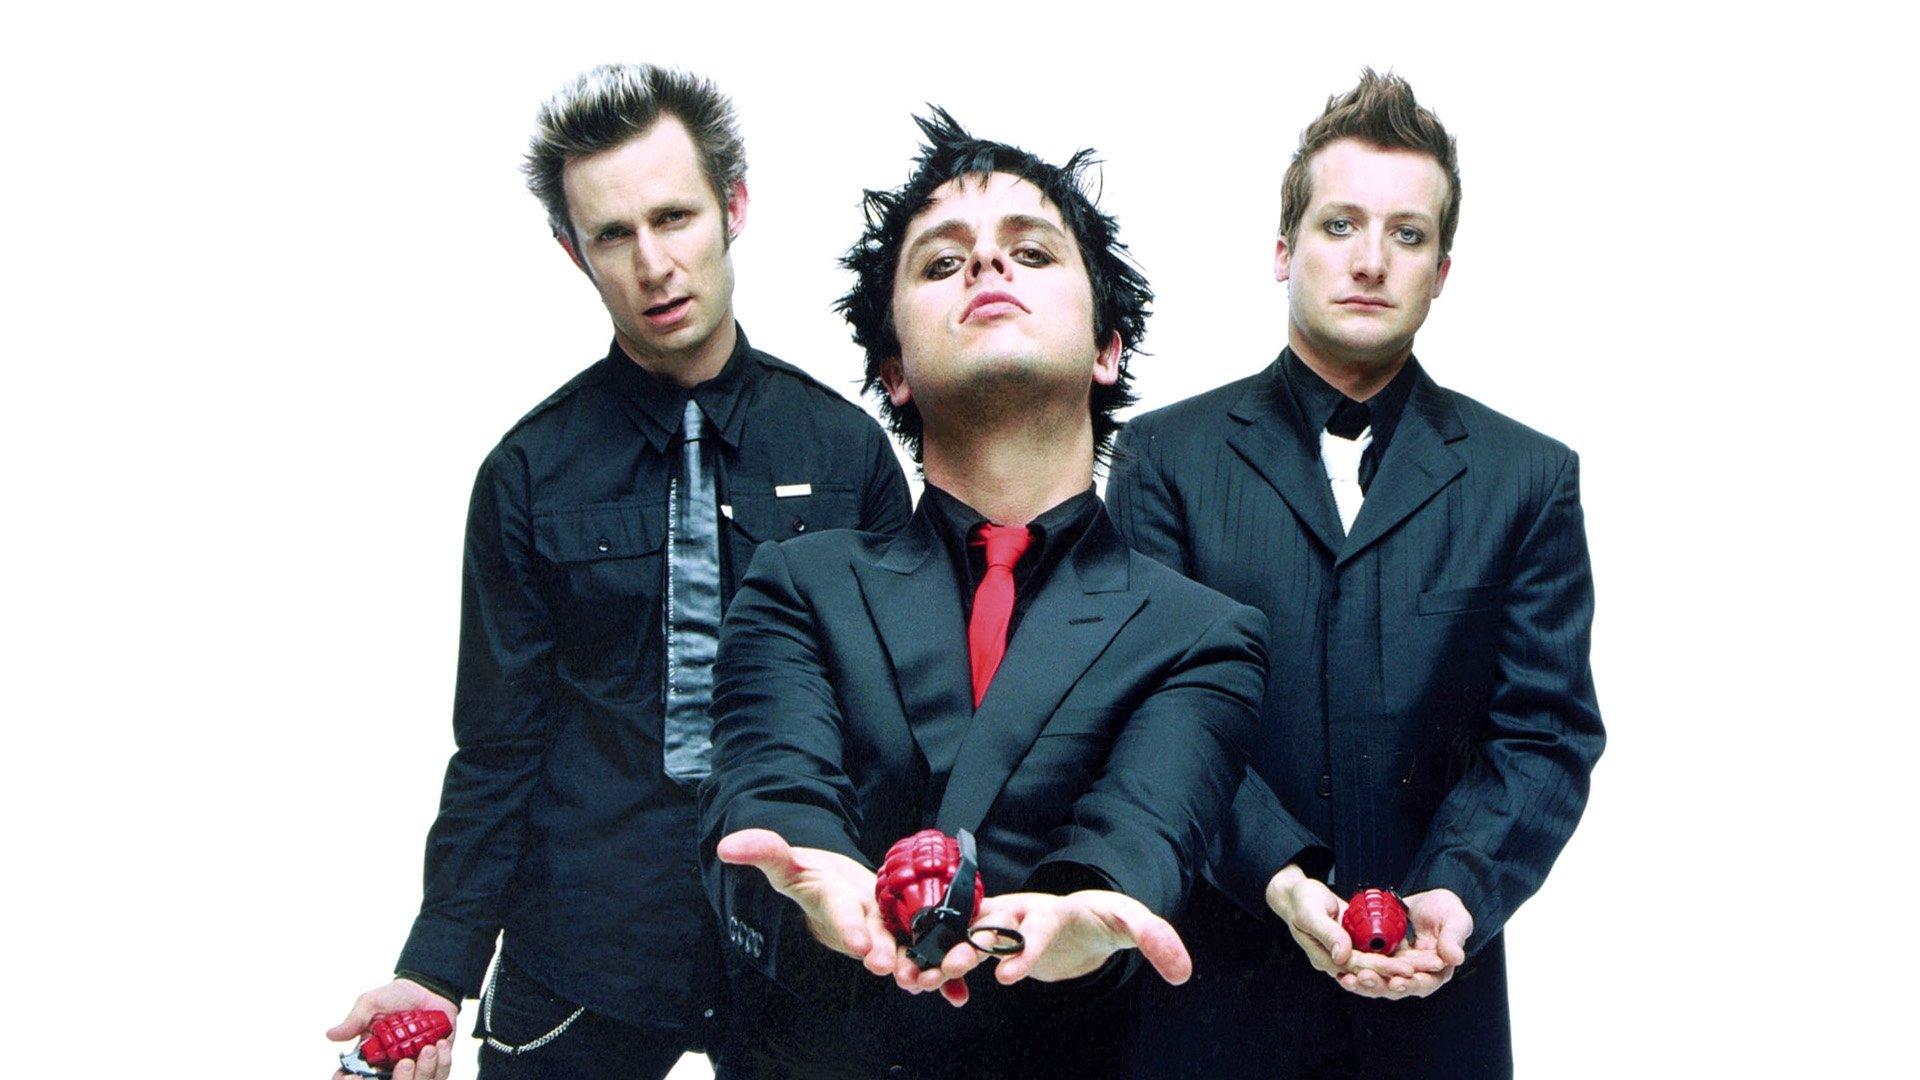 Green Day Wallpaper Download Full